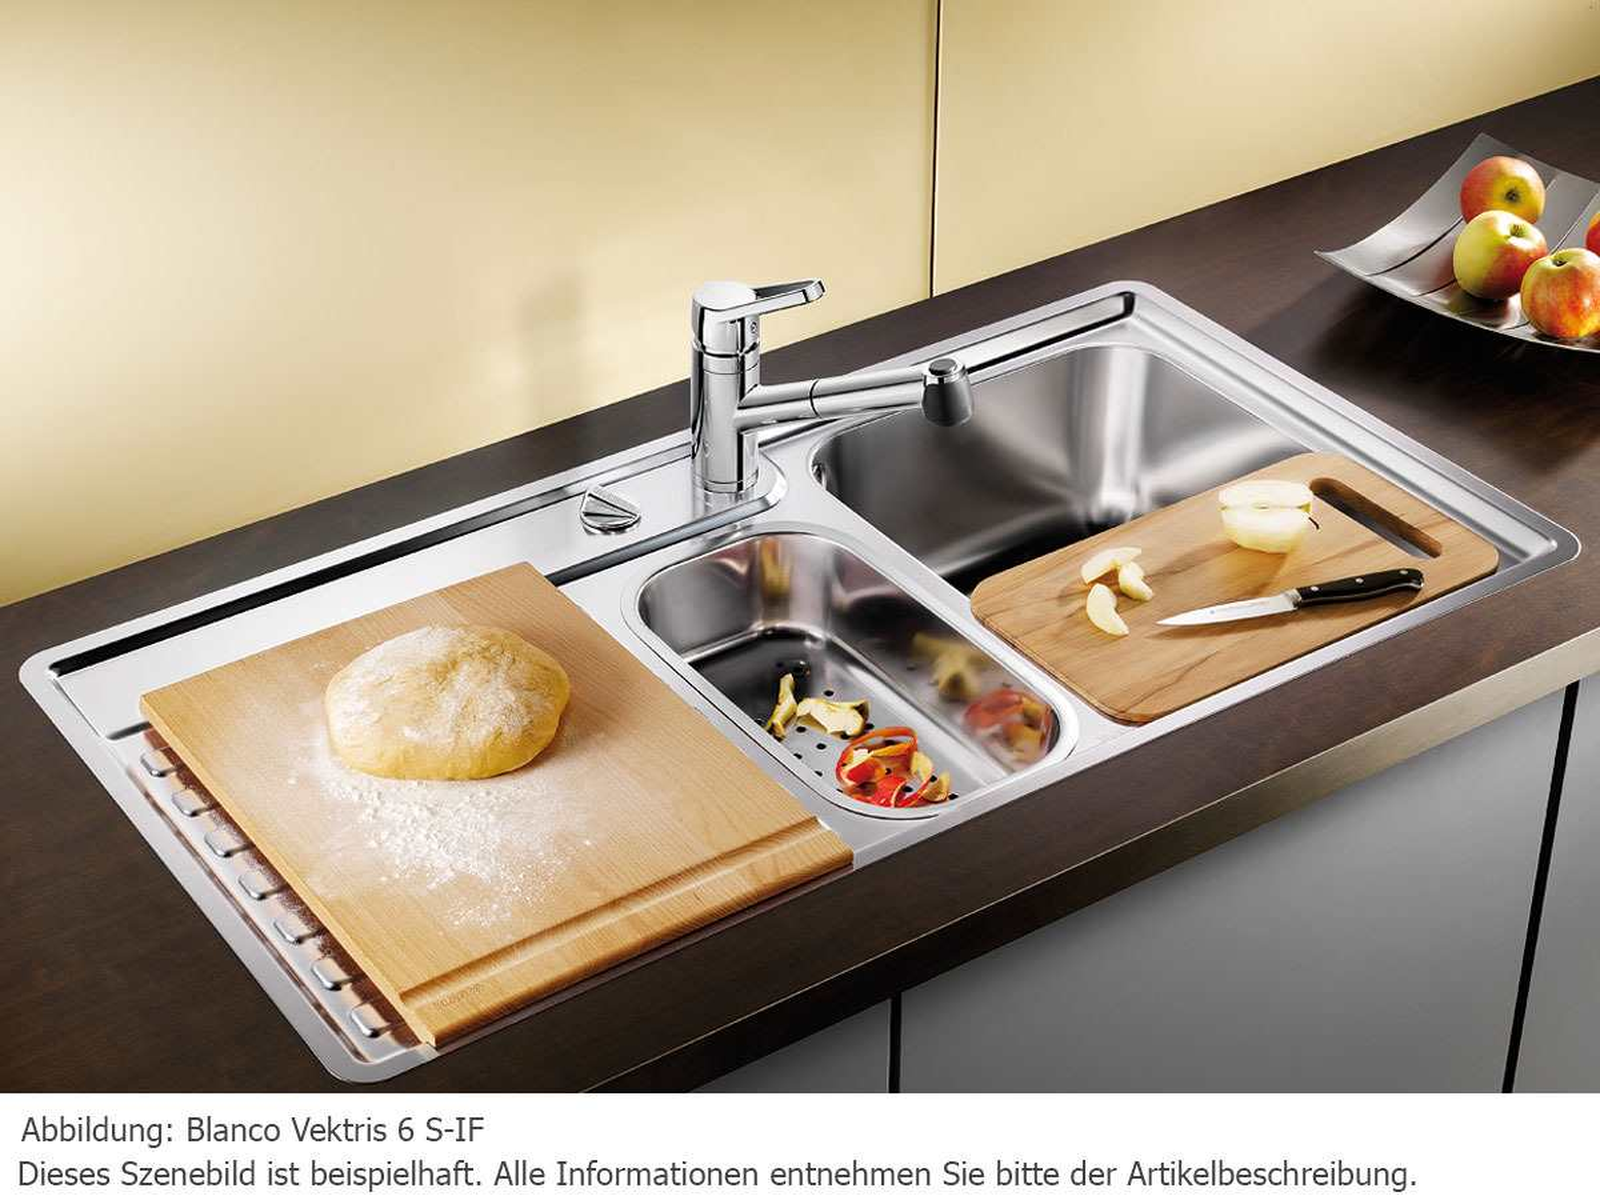 blanco vektris 6 s if edelstahlsp le seidenglanz m hlau bei chemnitz. Black Bedroom Furniture Sets. Home Design Ideas